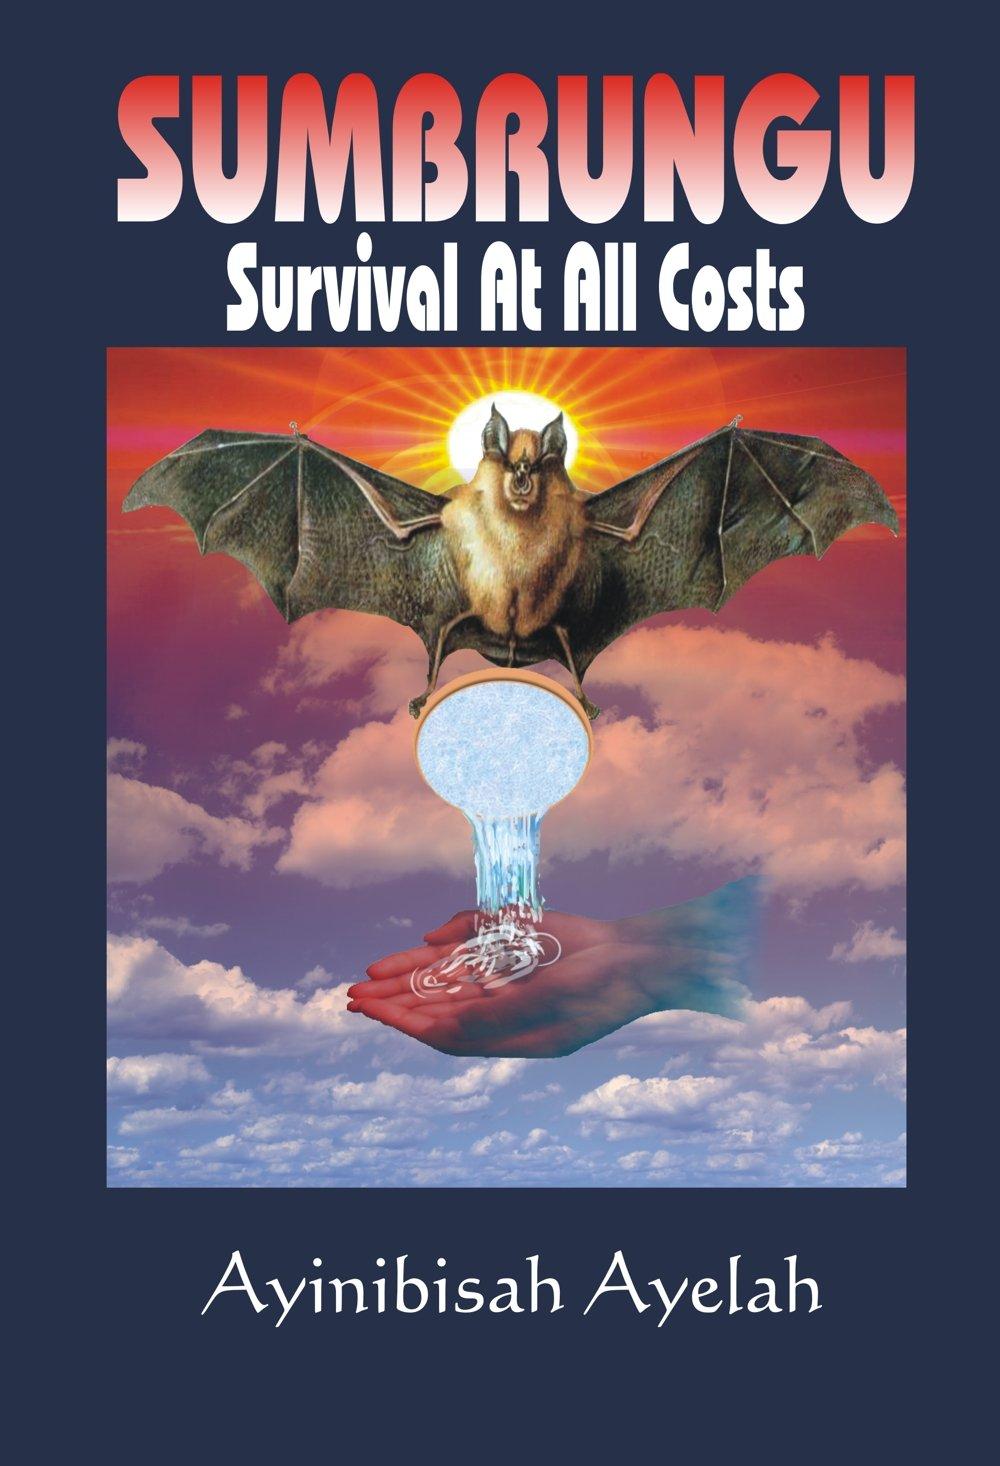 Sumbrungu--Survival at All Costs